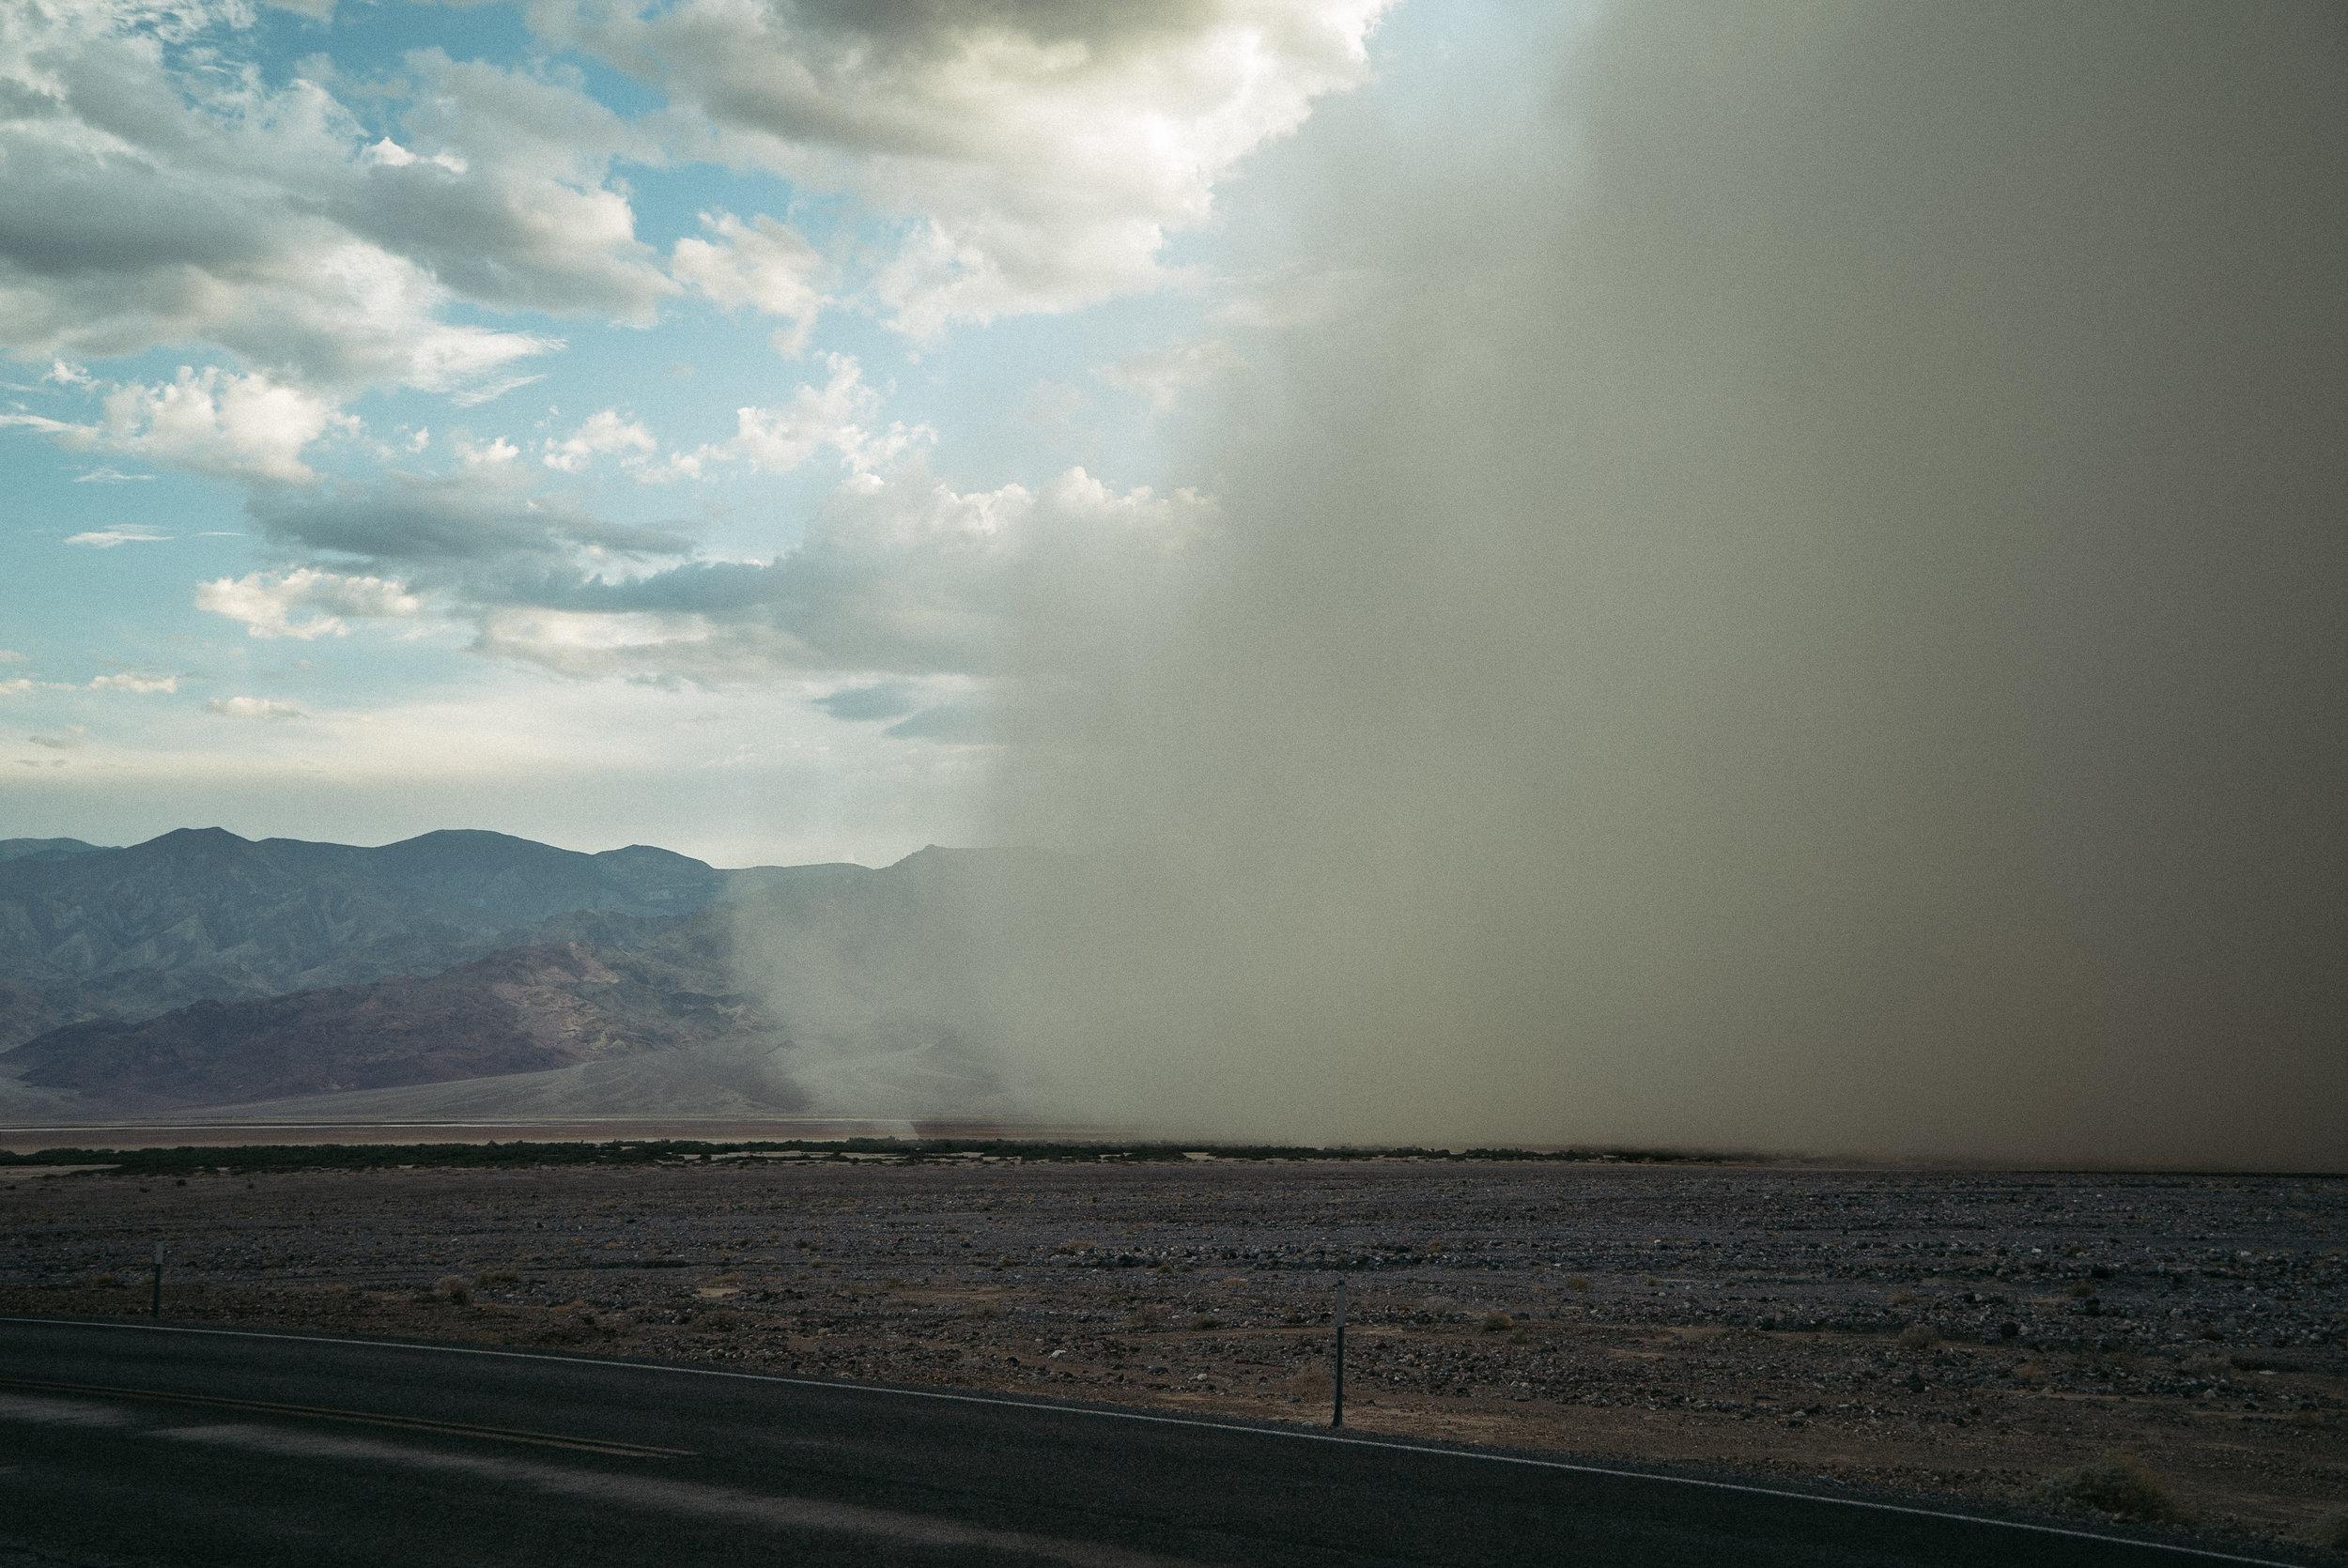 duststorm - landscapeclean.jpg